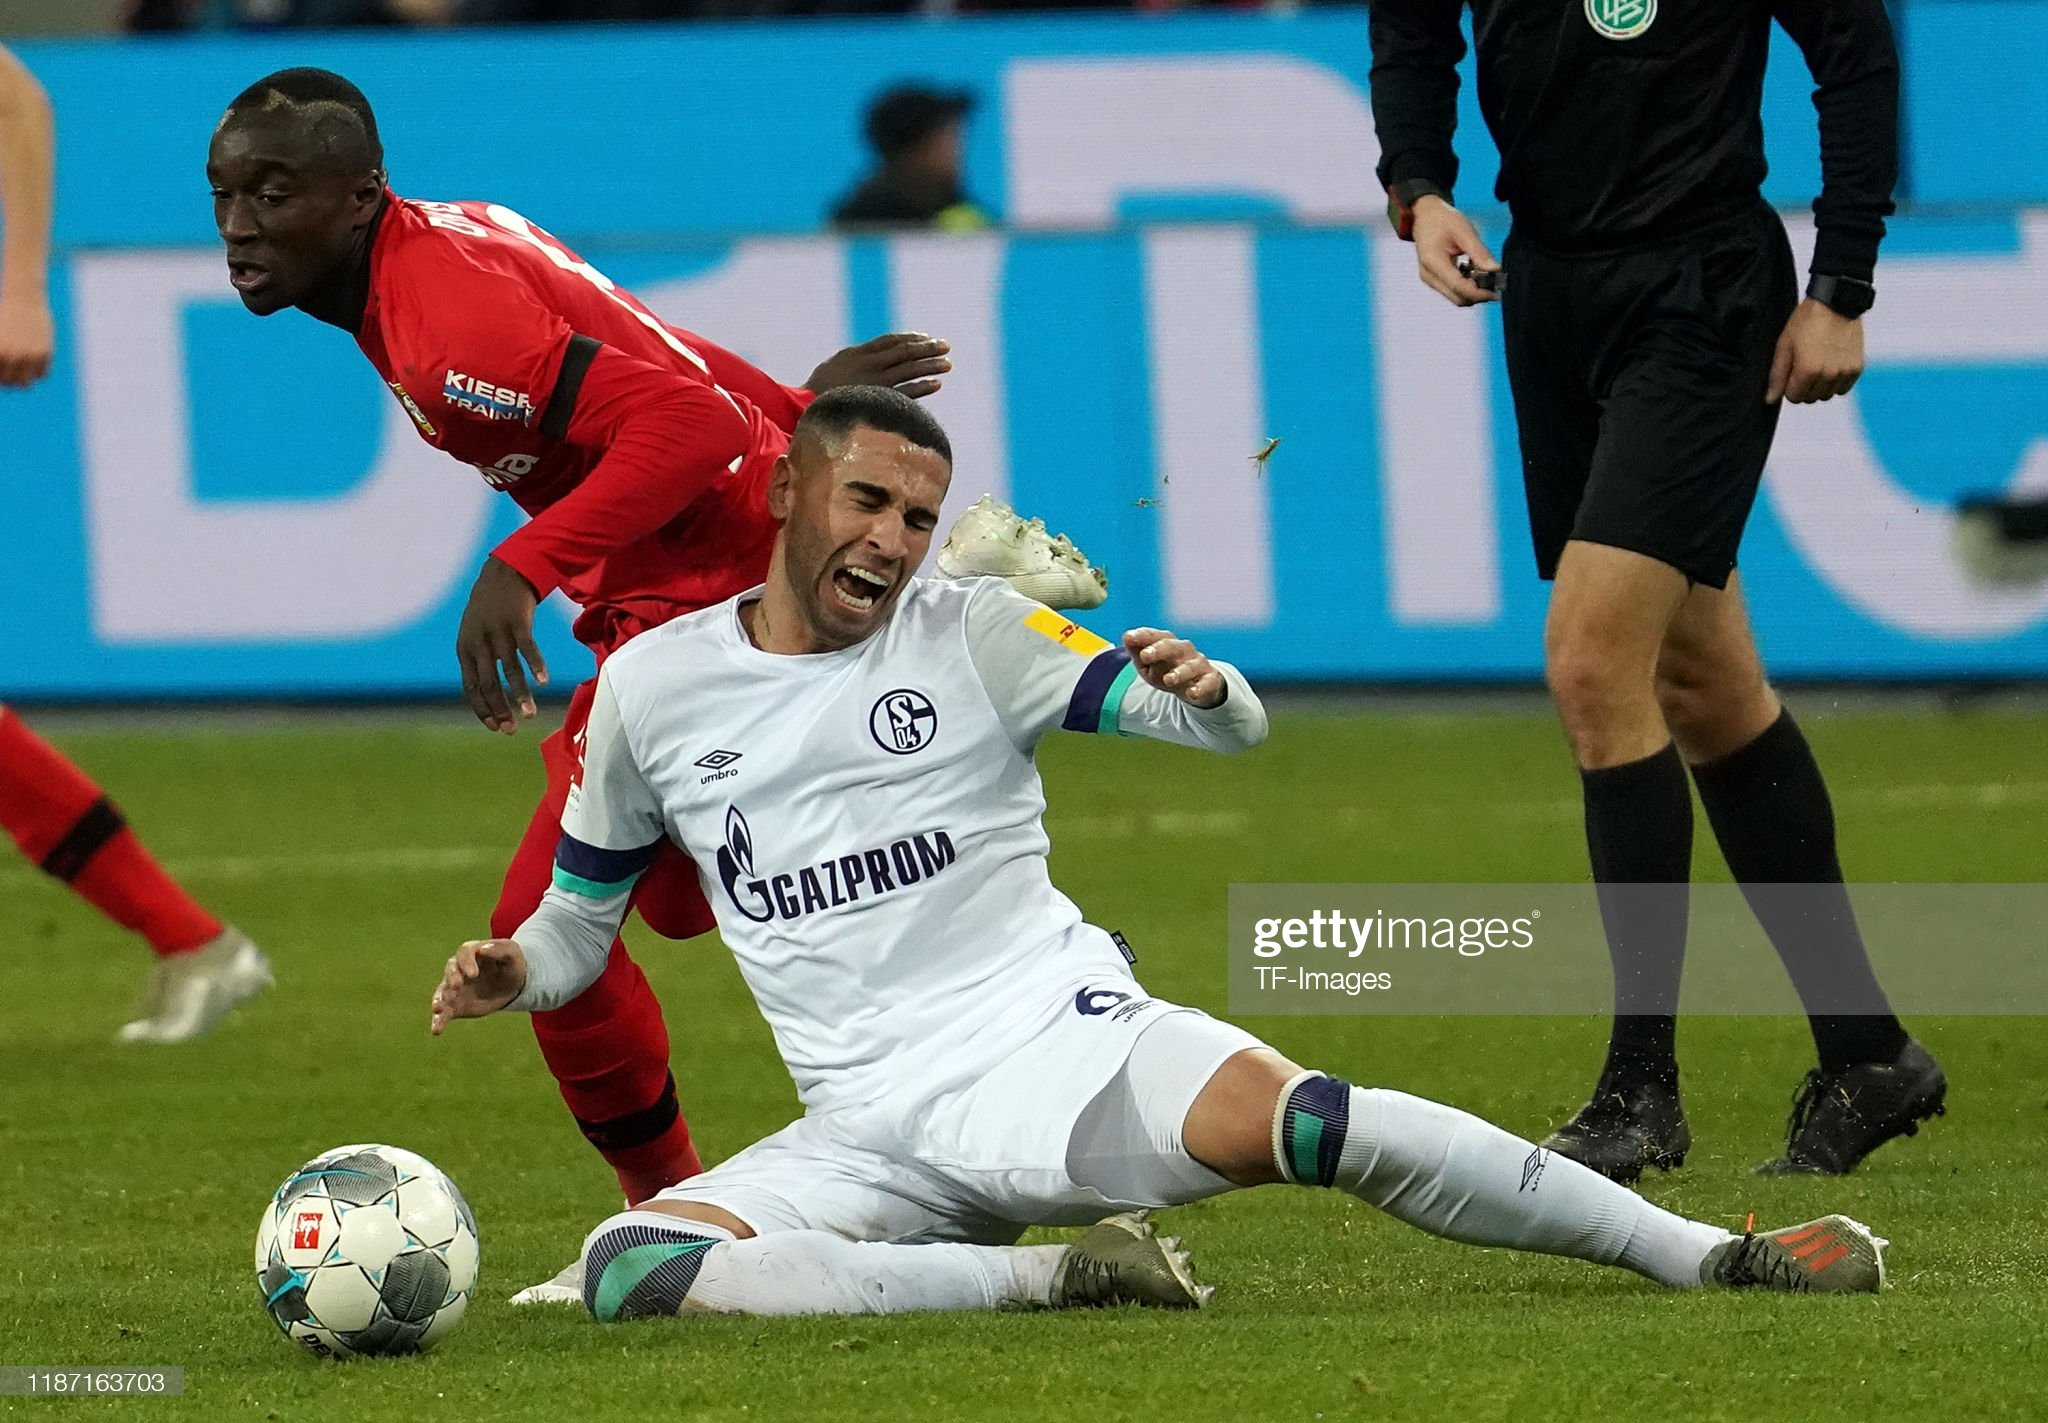 Schalke vs Bayer Leverkusen Preview, prediction and odds